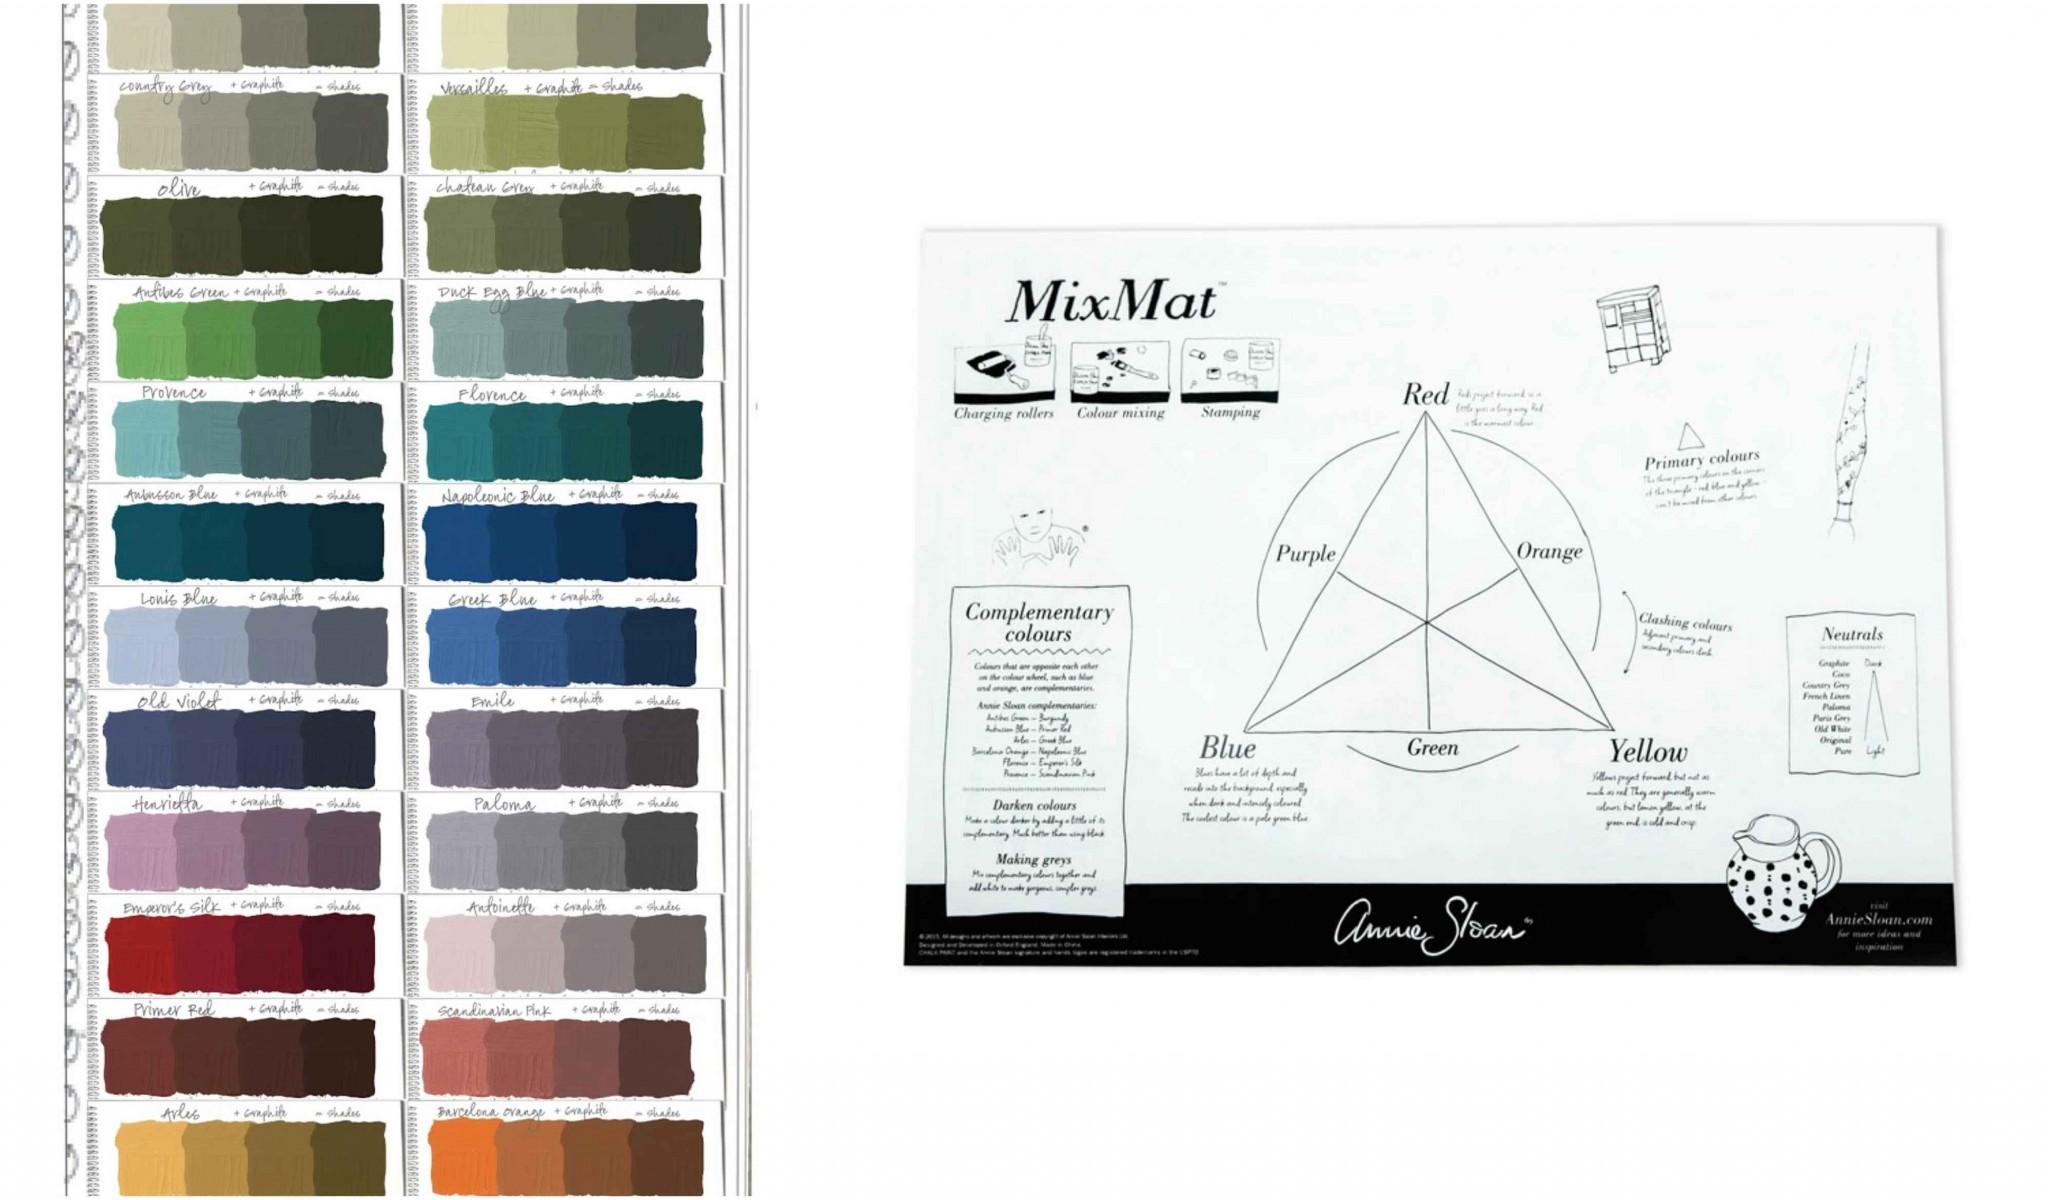 la chalk paint en 8 questions interior design ideas home decor blog. Black Bedroom Furniture Sets. Home Design Ideas